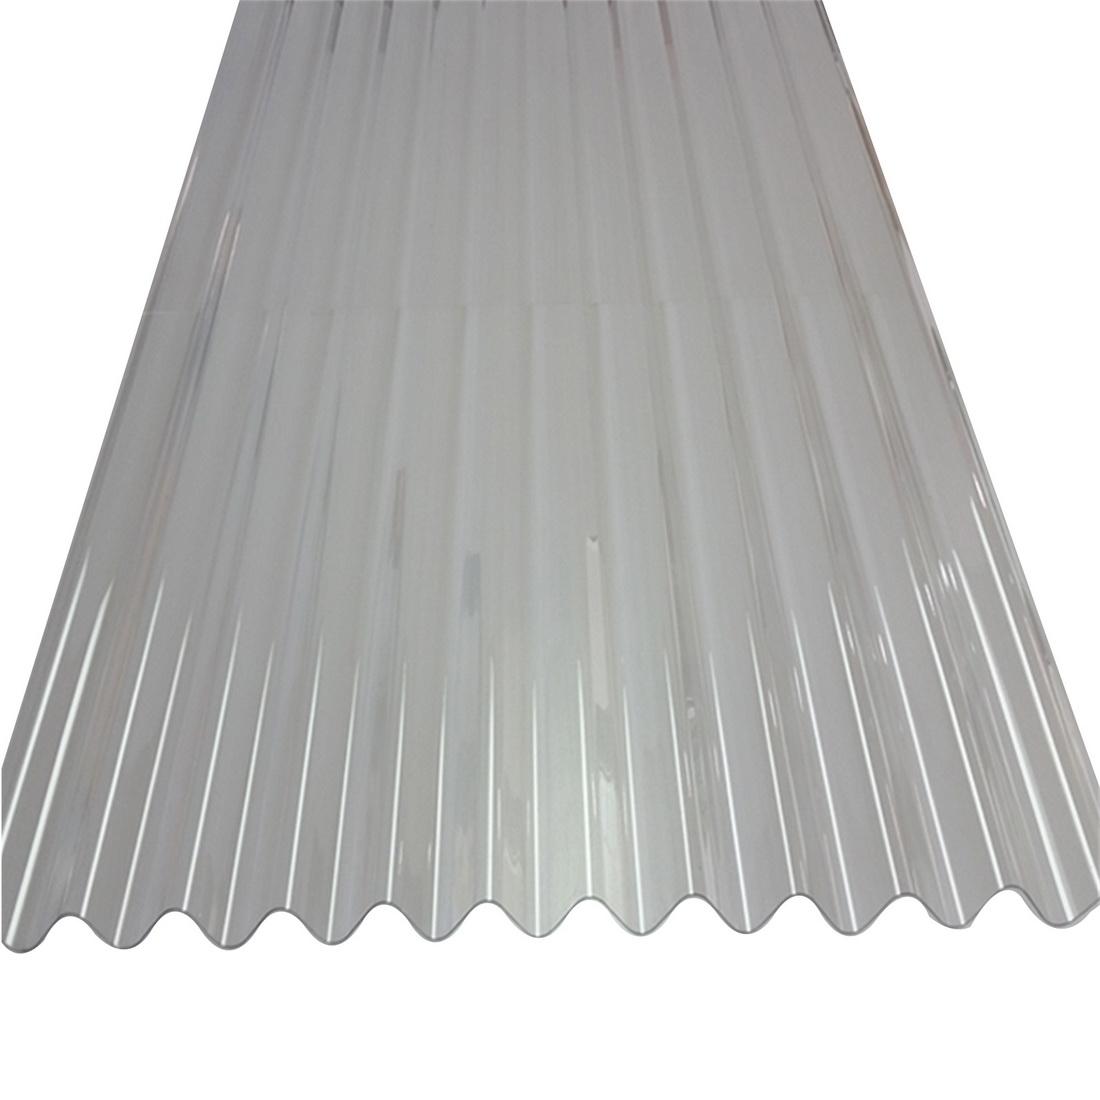 Sunlite Corrugated Roofing 1800 x 660 x 0.8mm PVC Clear SUN-CORR-CLR-1800